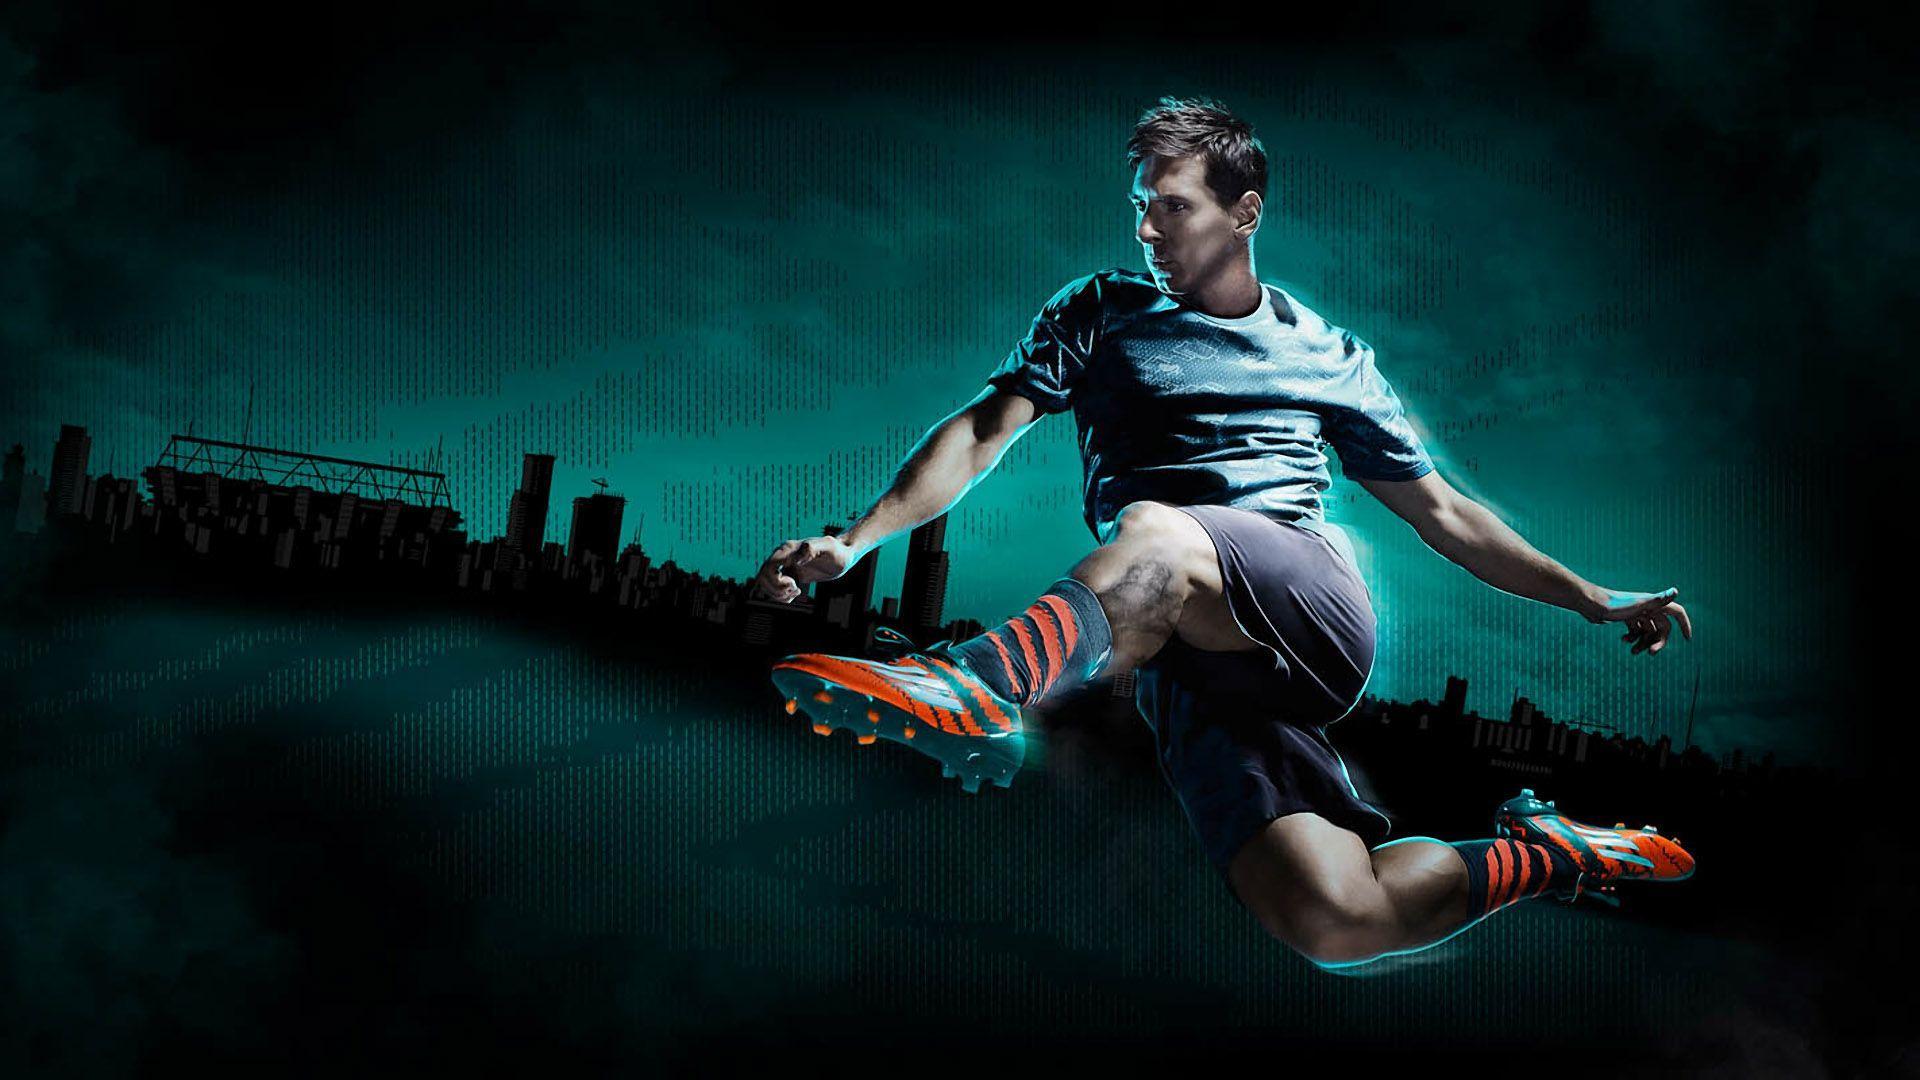 Messi Adidas Wallpapers Wallpaper Cave